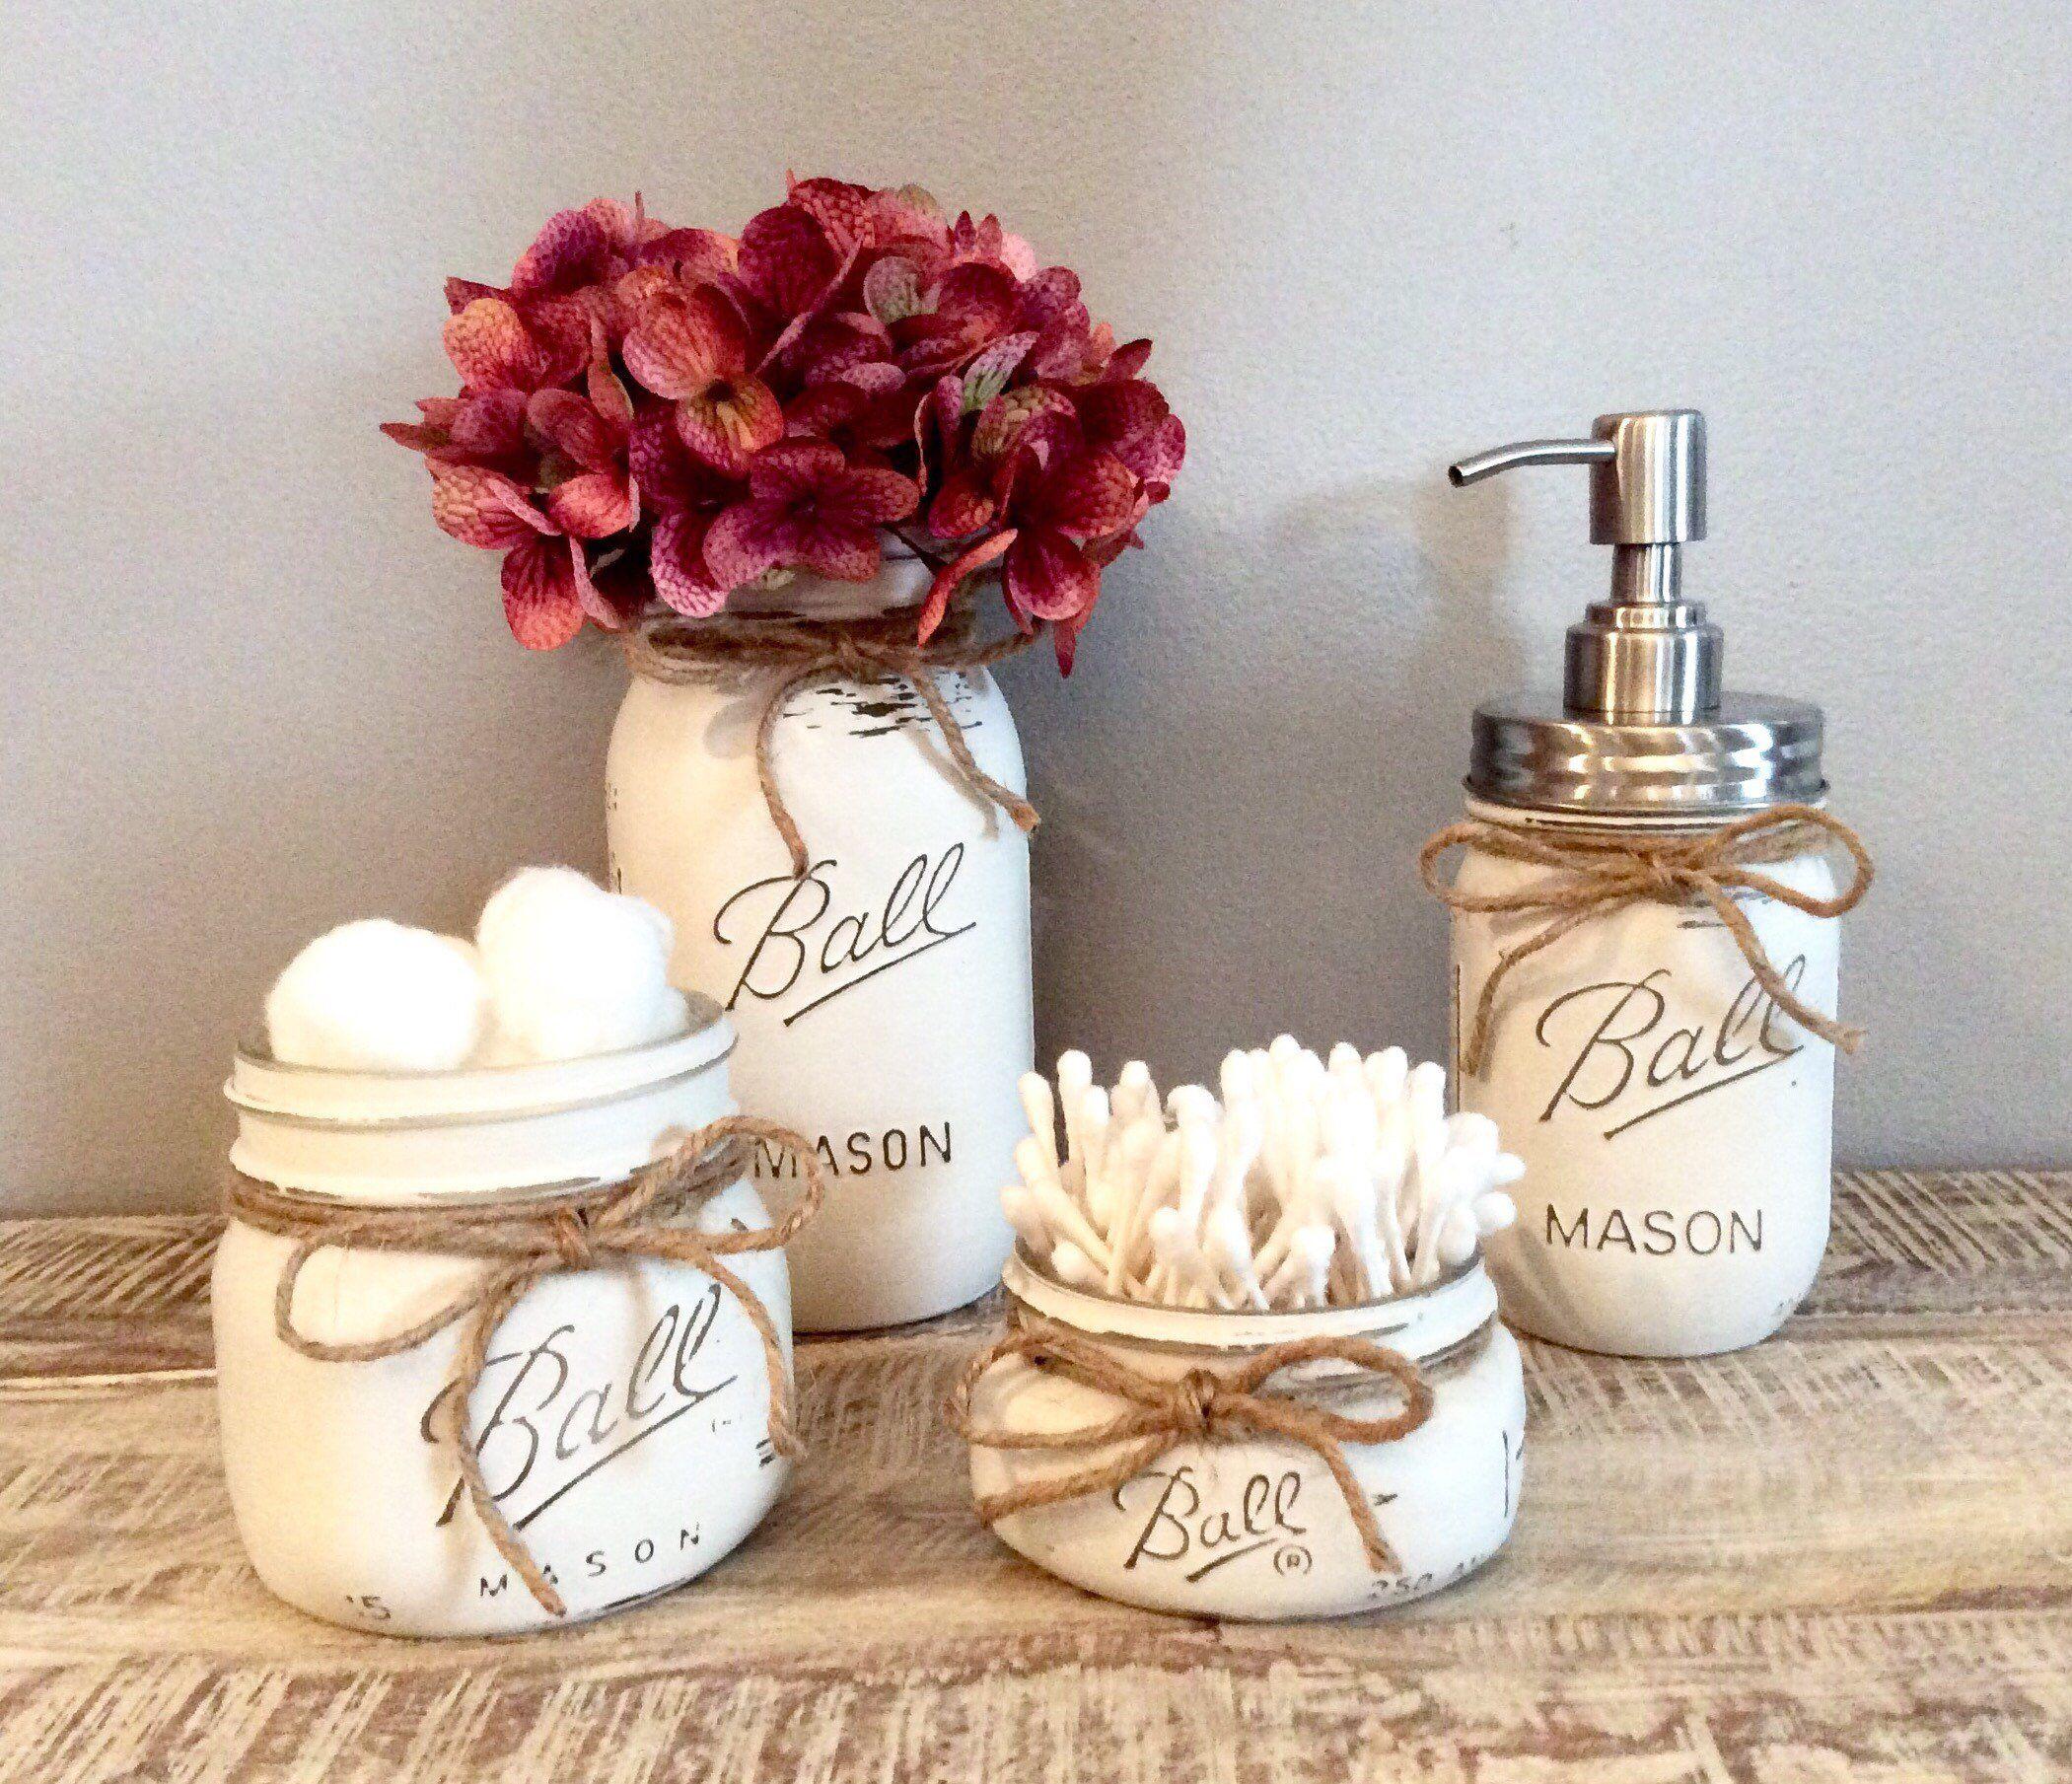 Mason Jar Bathroom Set, farmhouse bathroom, bathroom decor, mason jar decor, rustic decor, pink decor #masonjarbathroom